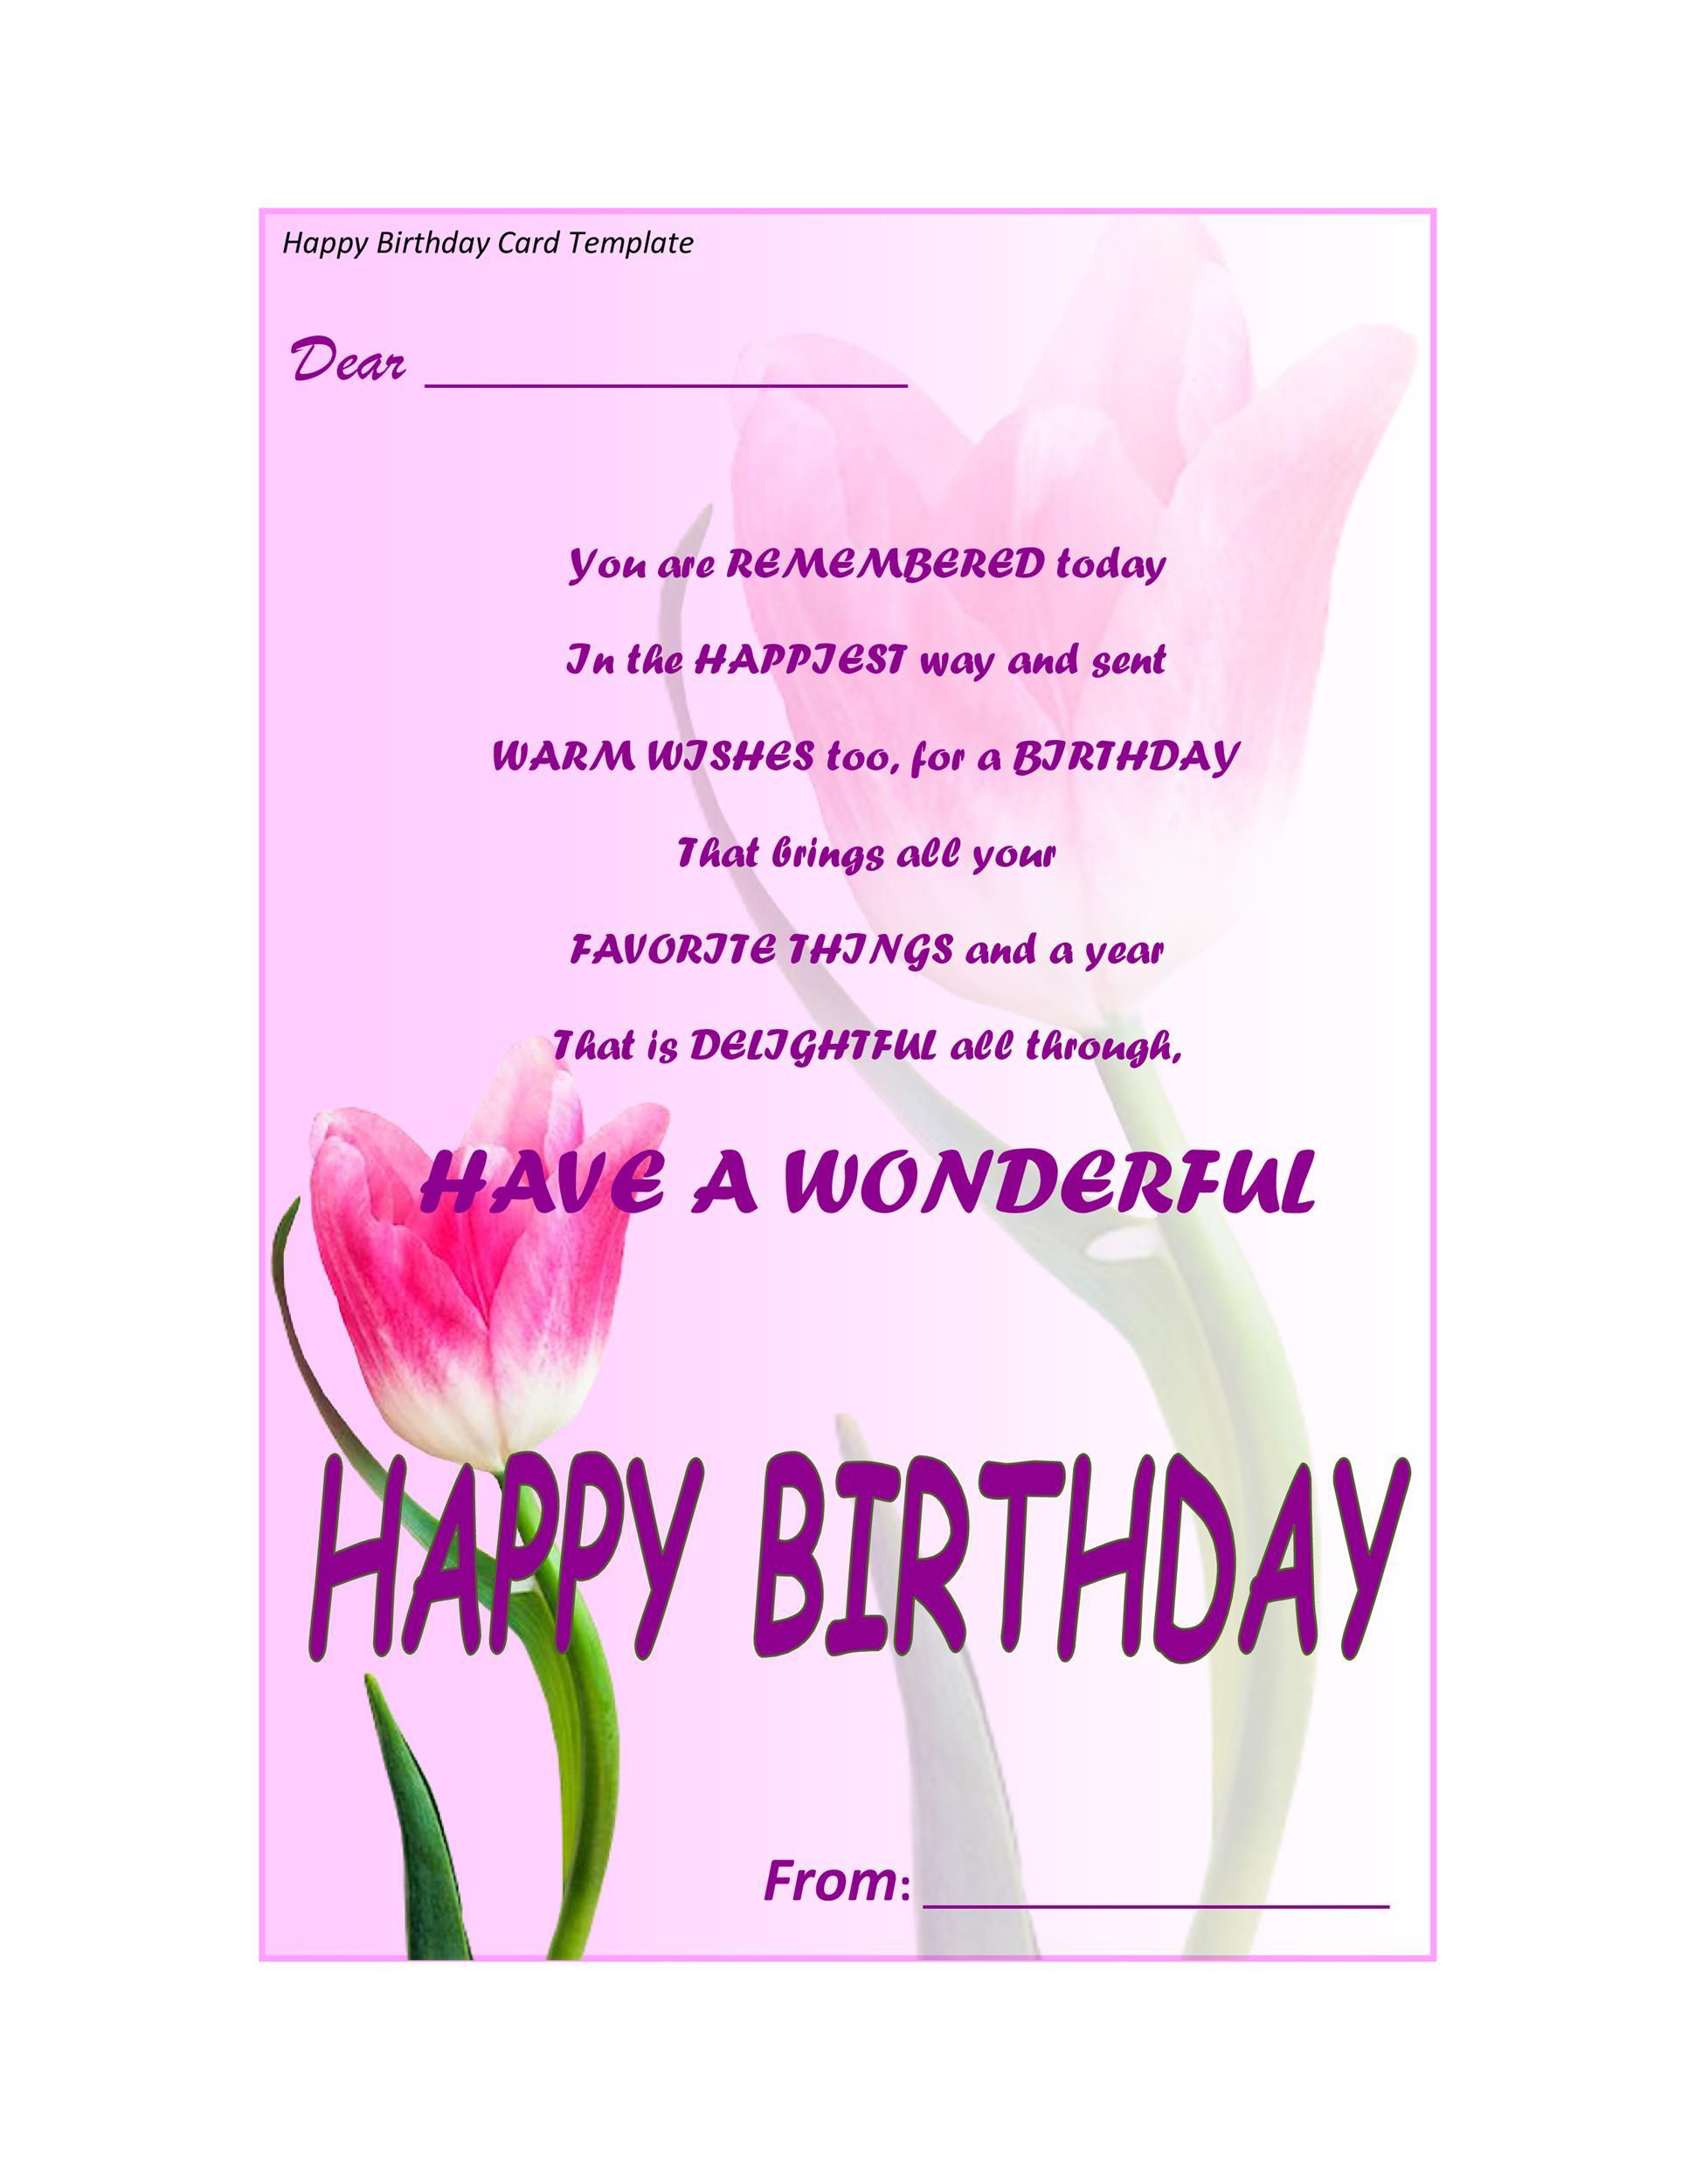 Free birthday card template 32